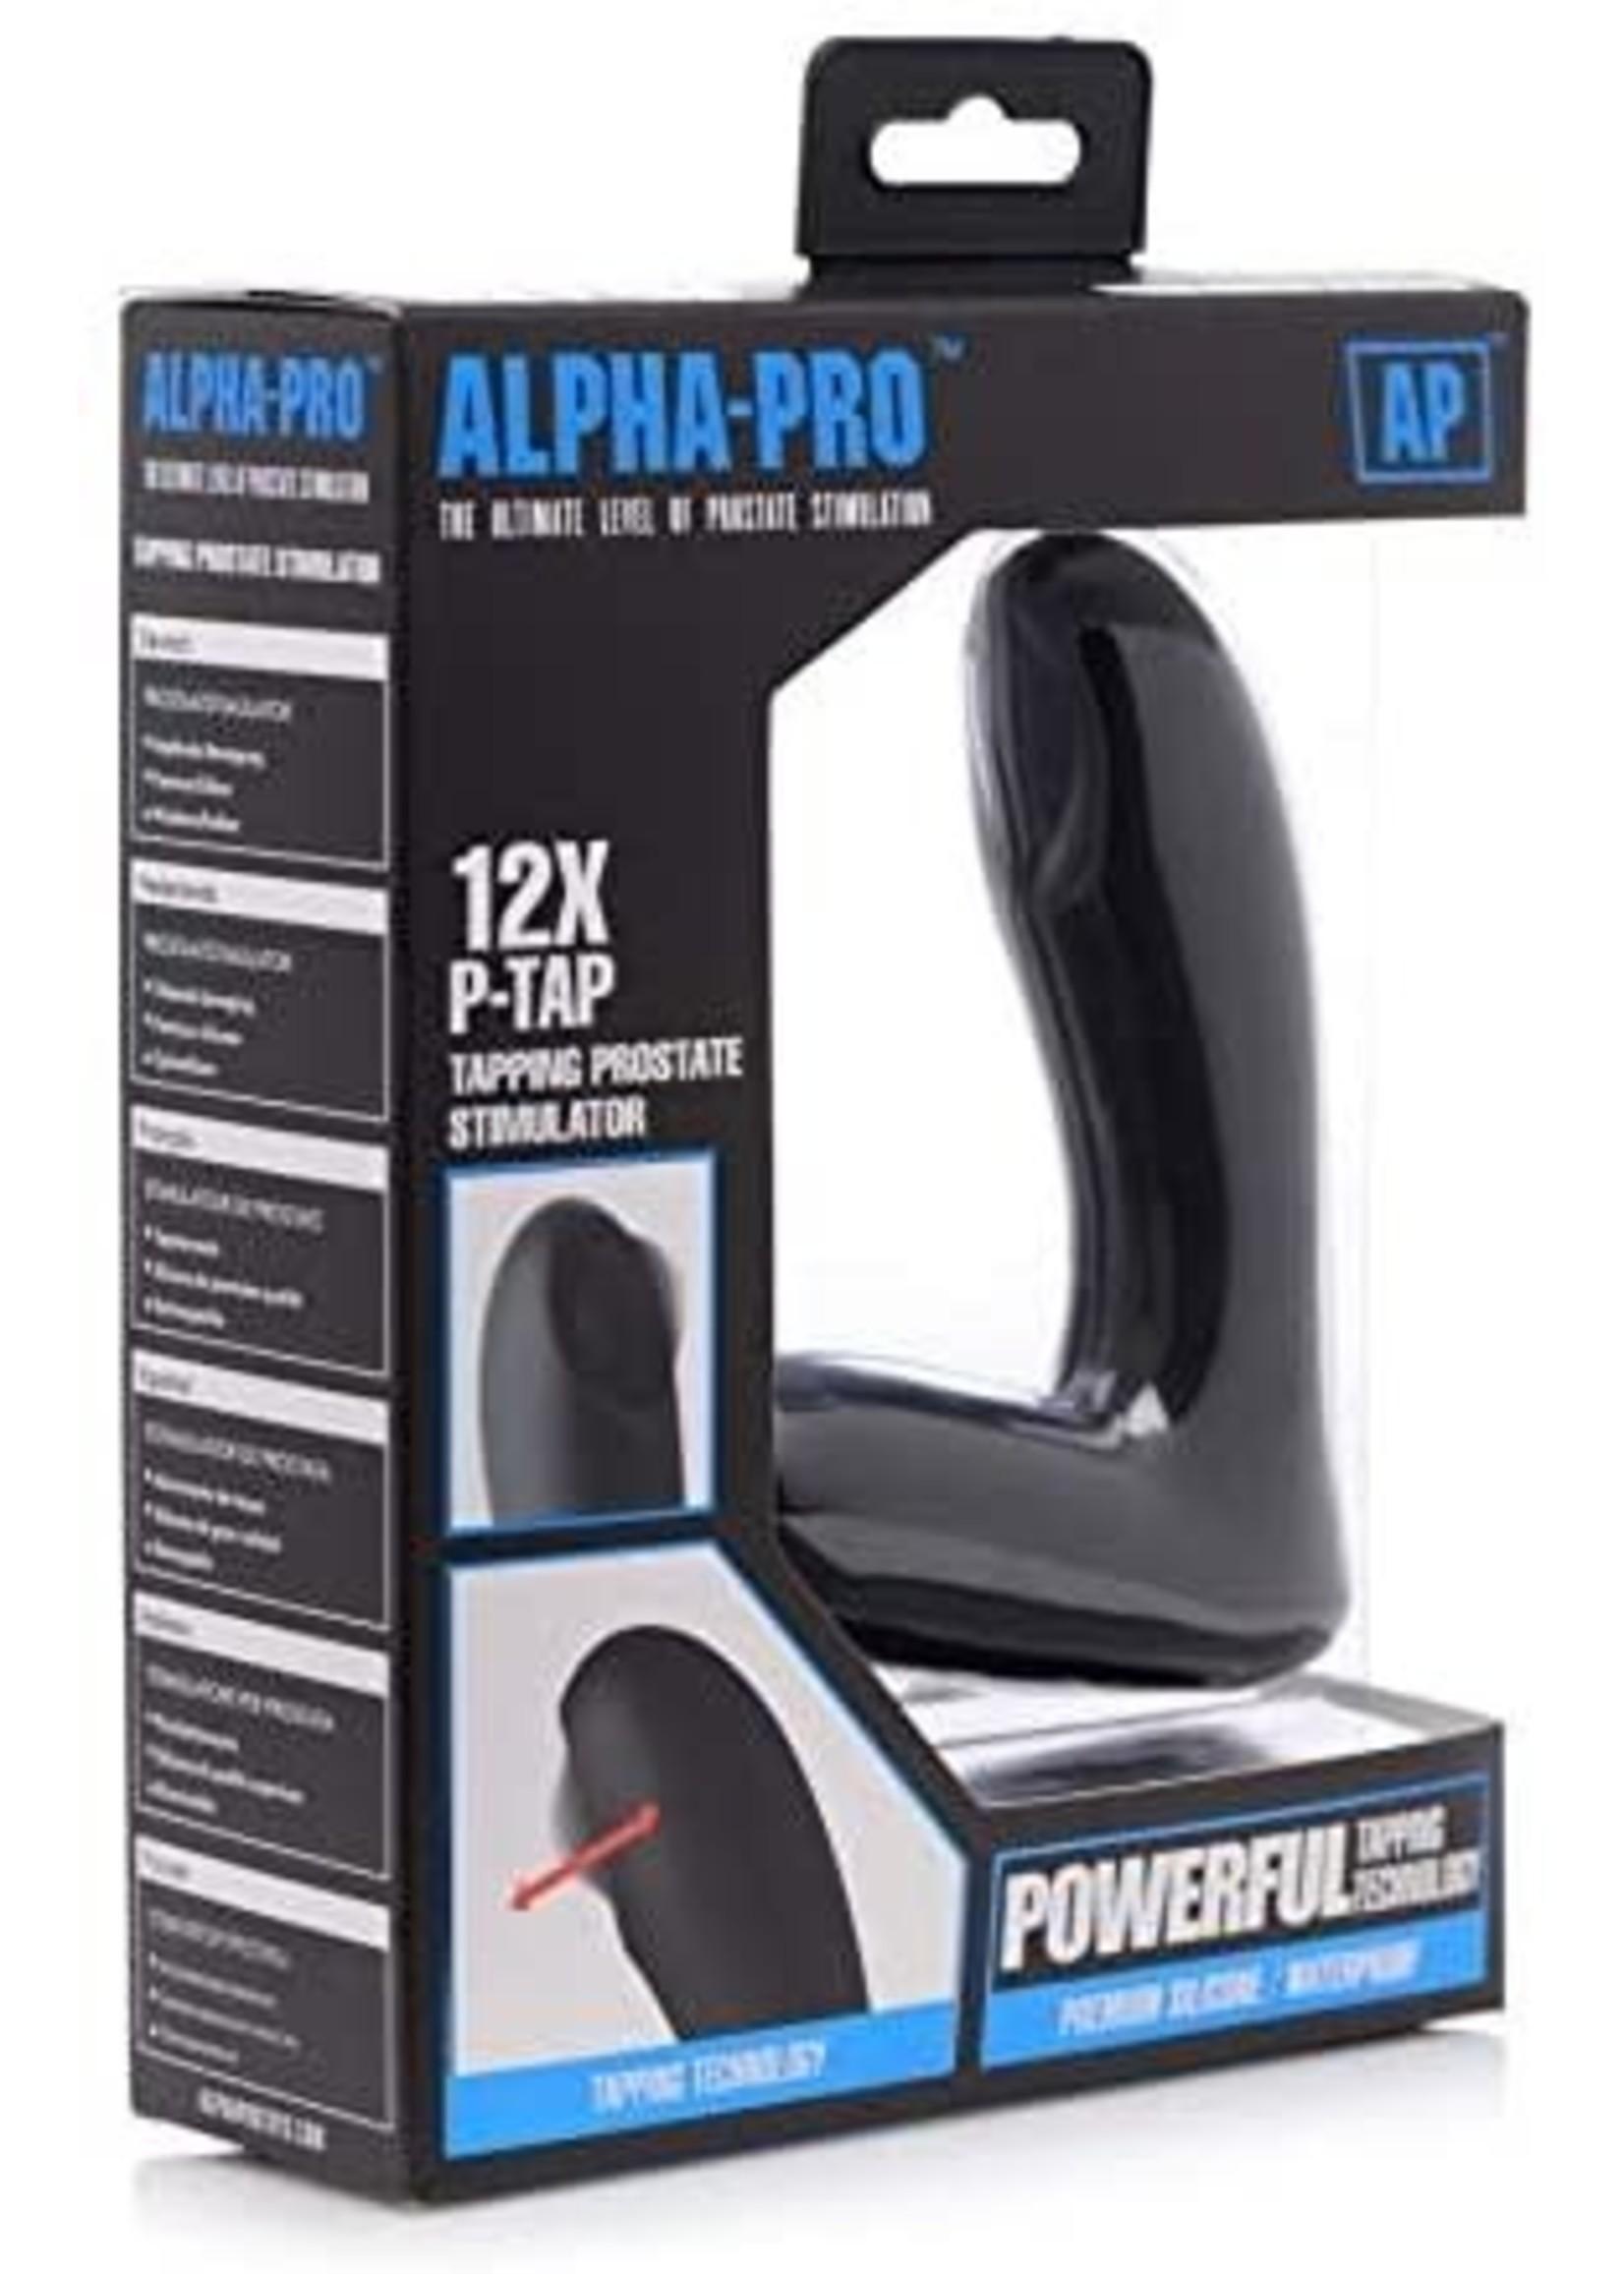 Alpha-Pro Alpha-Pro 12x P-Pulse